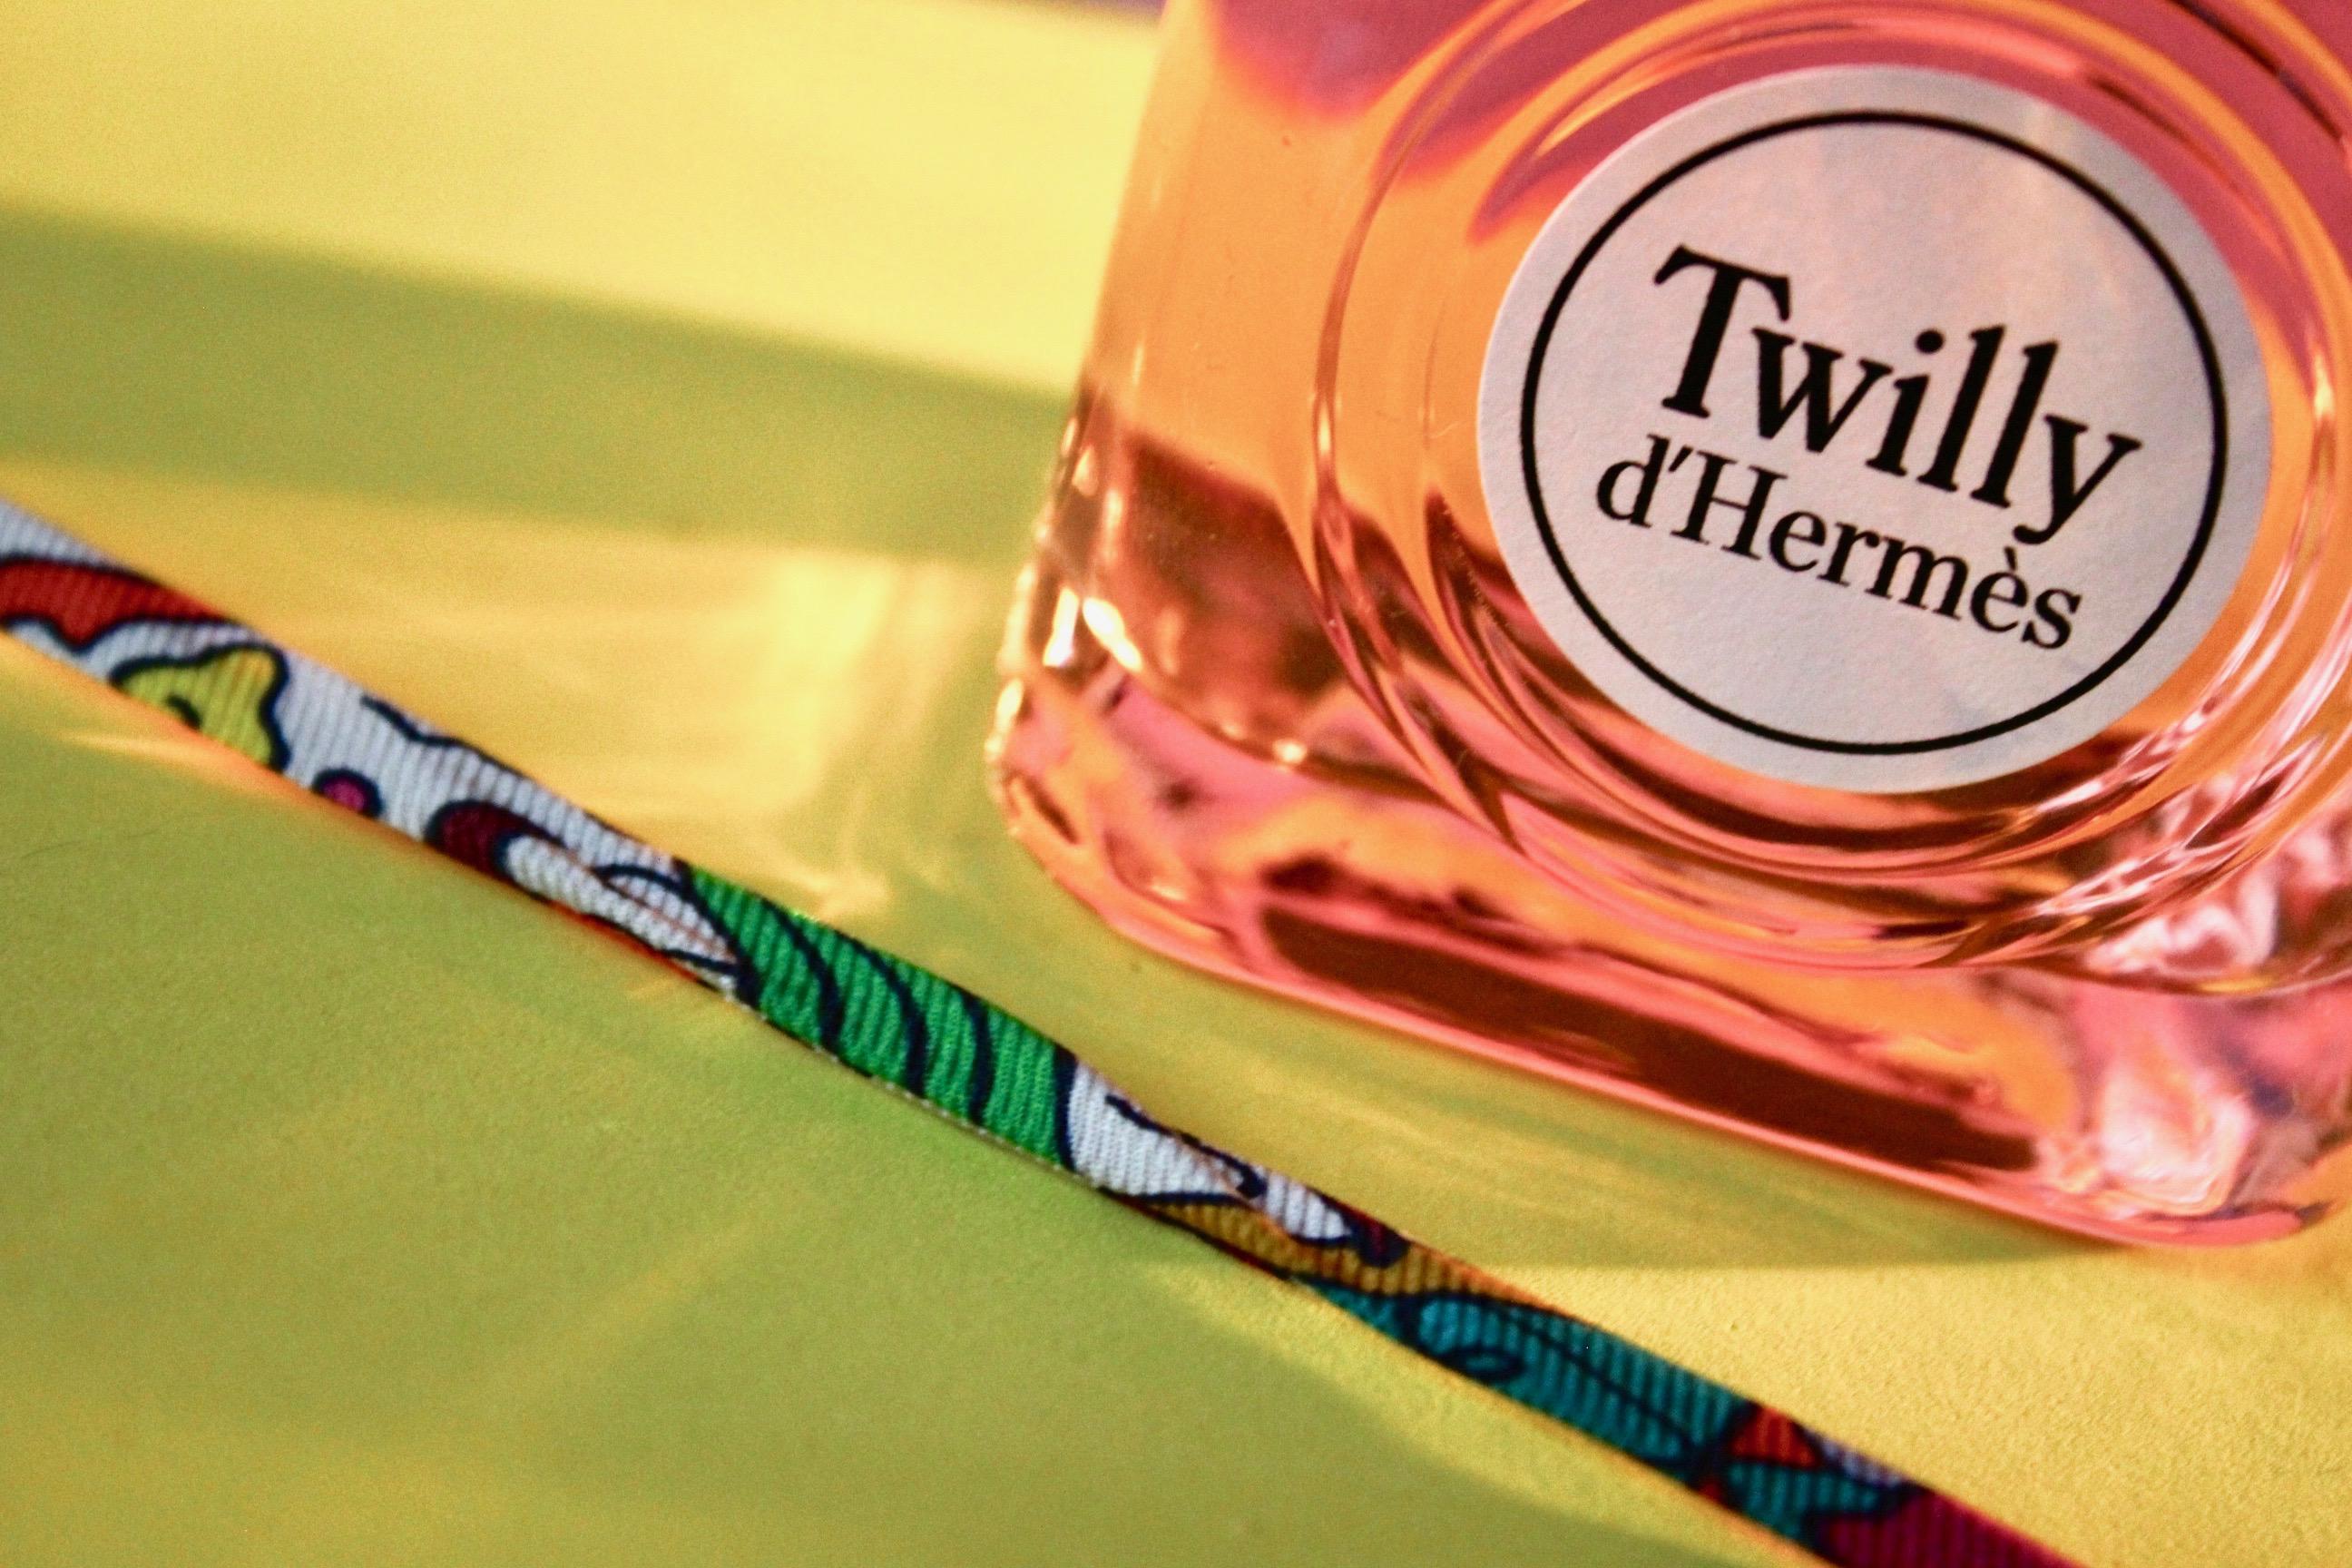 Perfume Review Twilly Dhermès By Hermès The Candy Perfume Boy